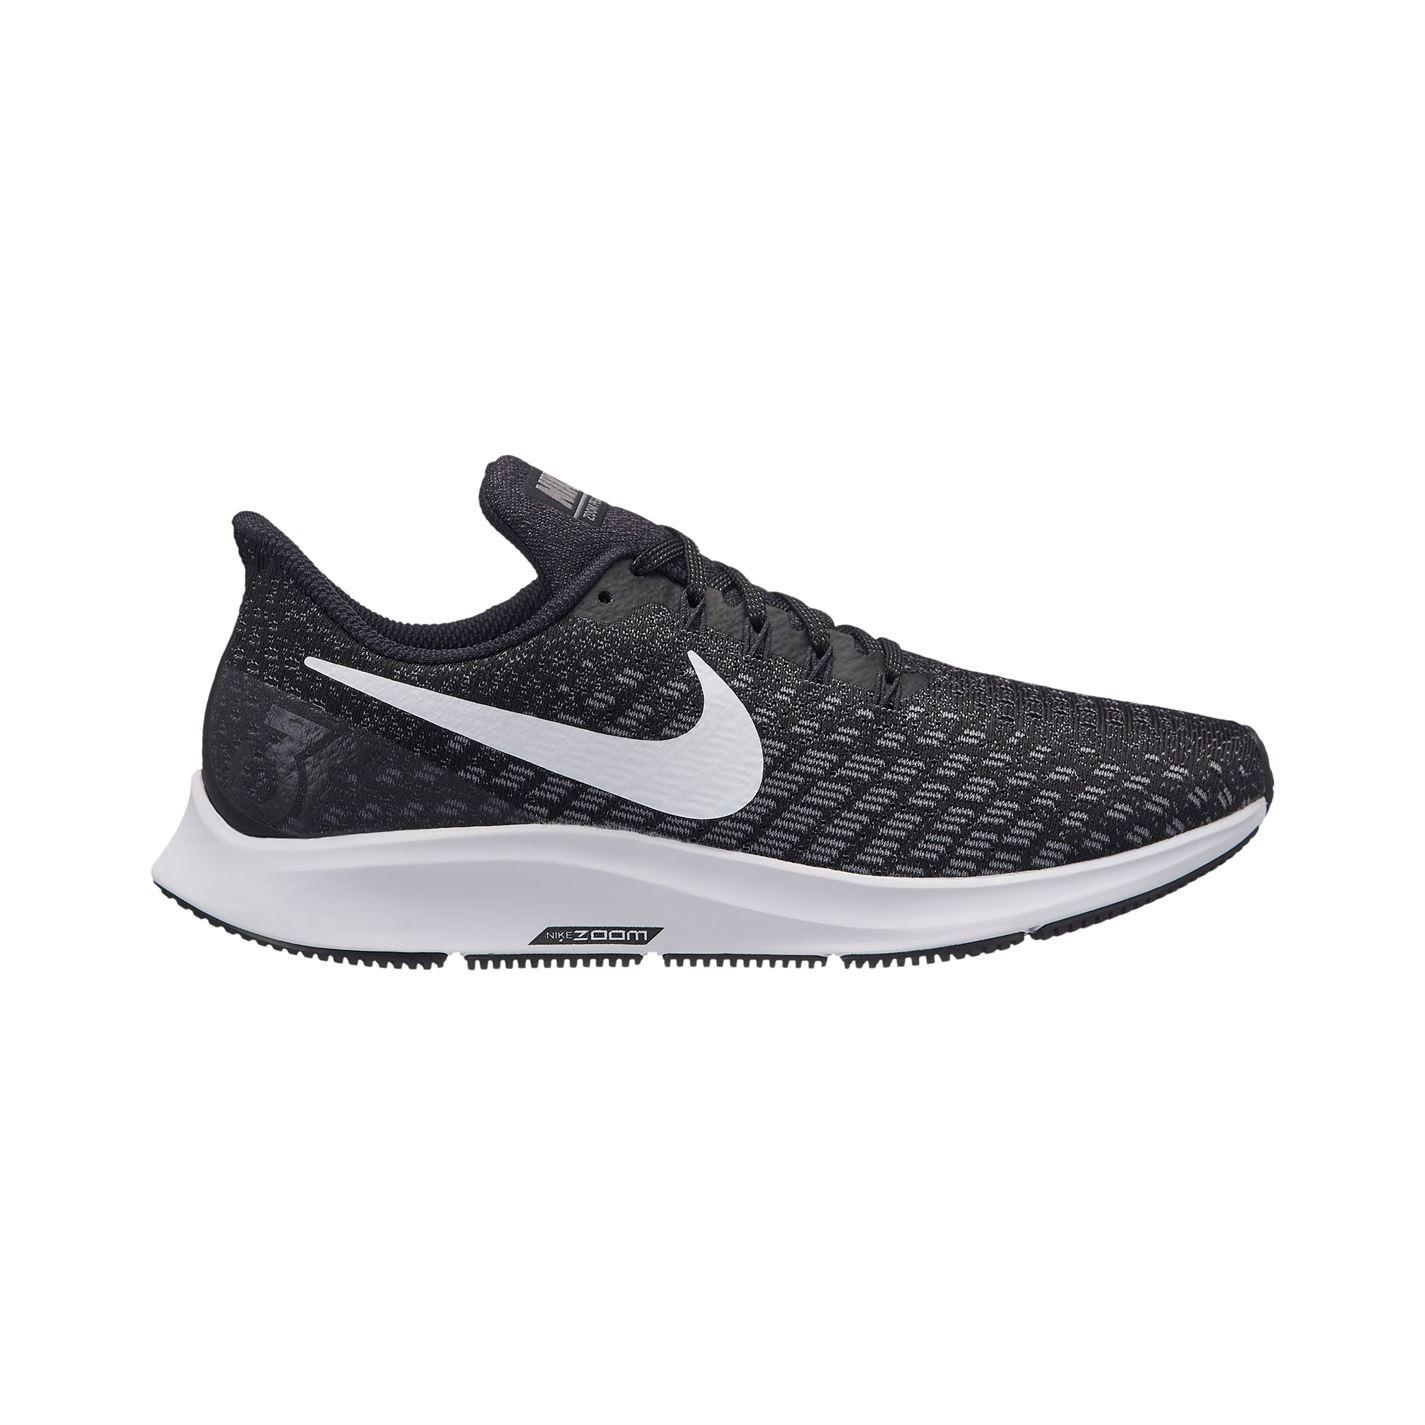 Nike Air Zoom Pegasus 35 dámska bežecká obuv Black White - Glami.sk 21b1fae6191